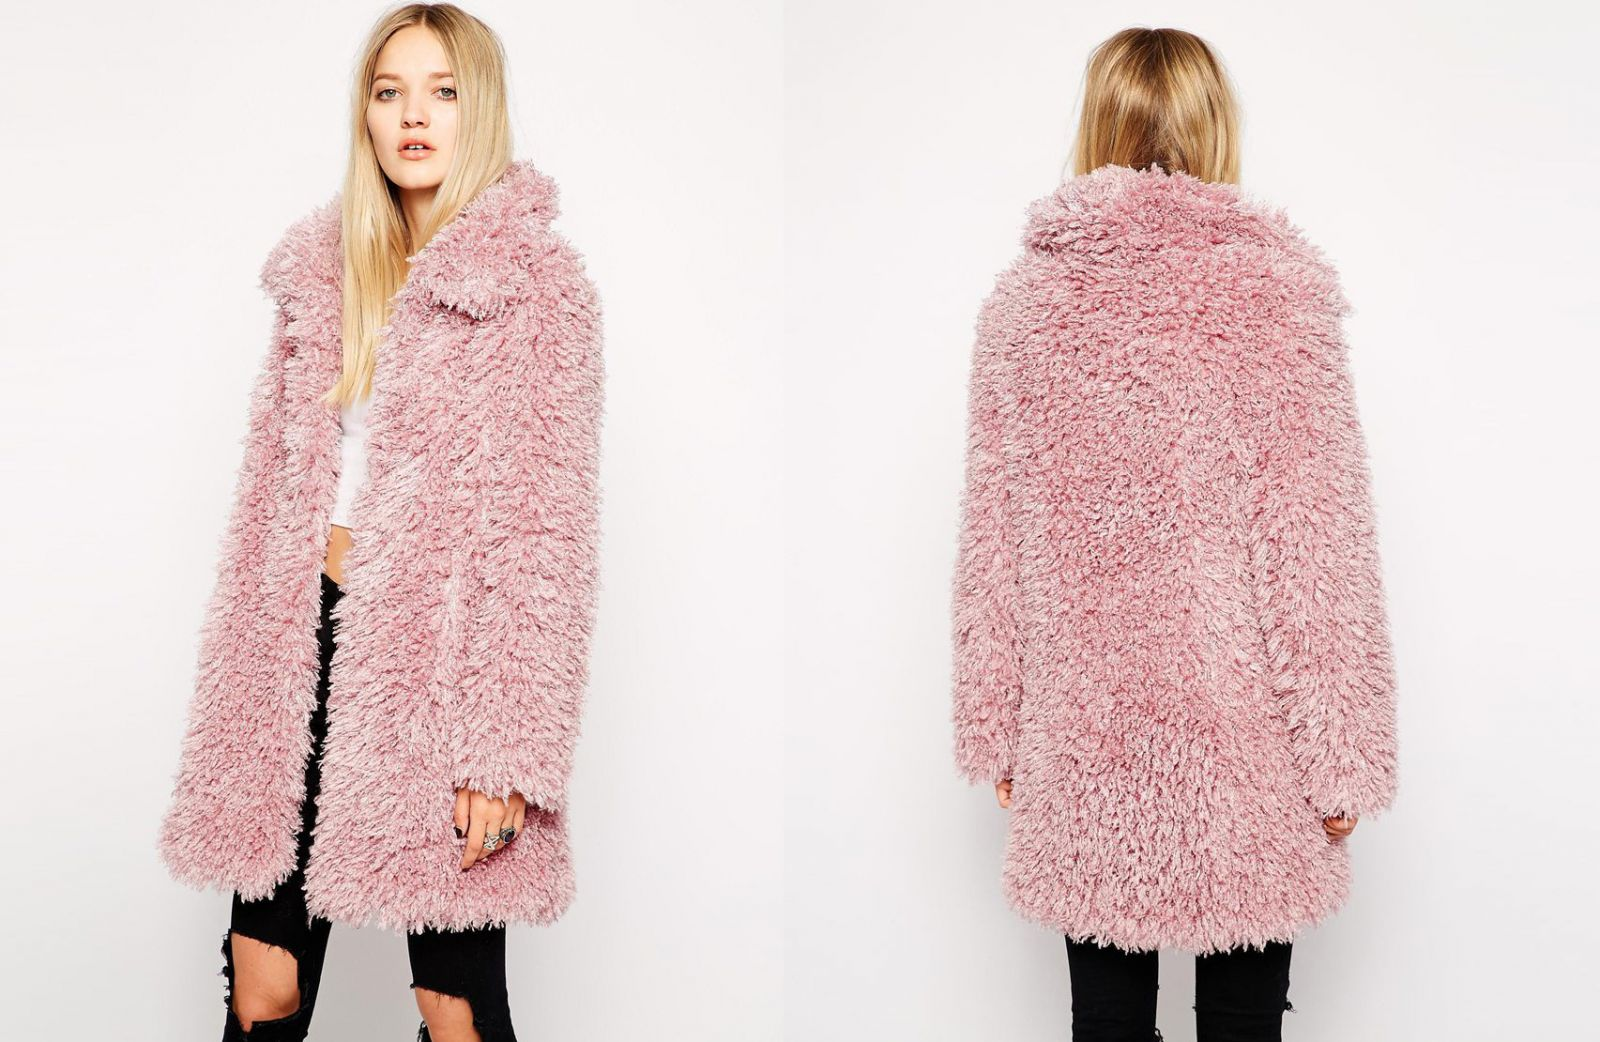 Куртка из овчины Gucci - фото №2